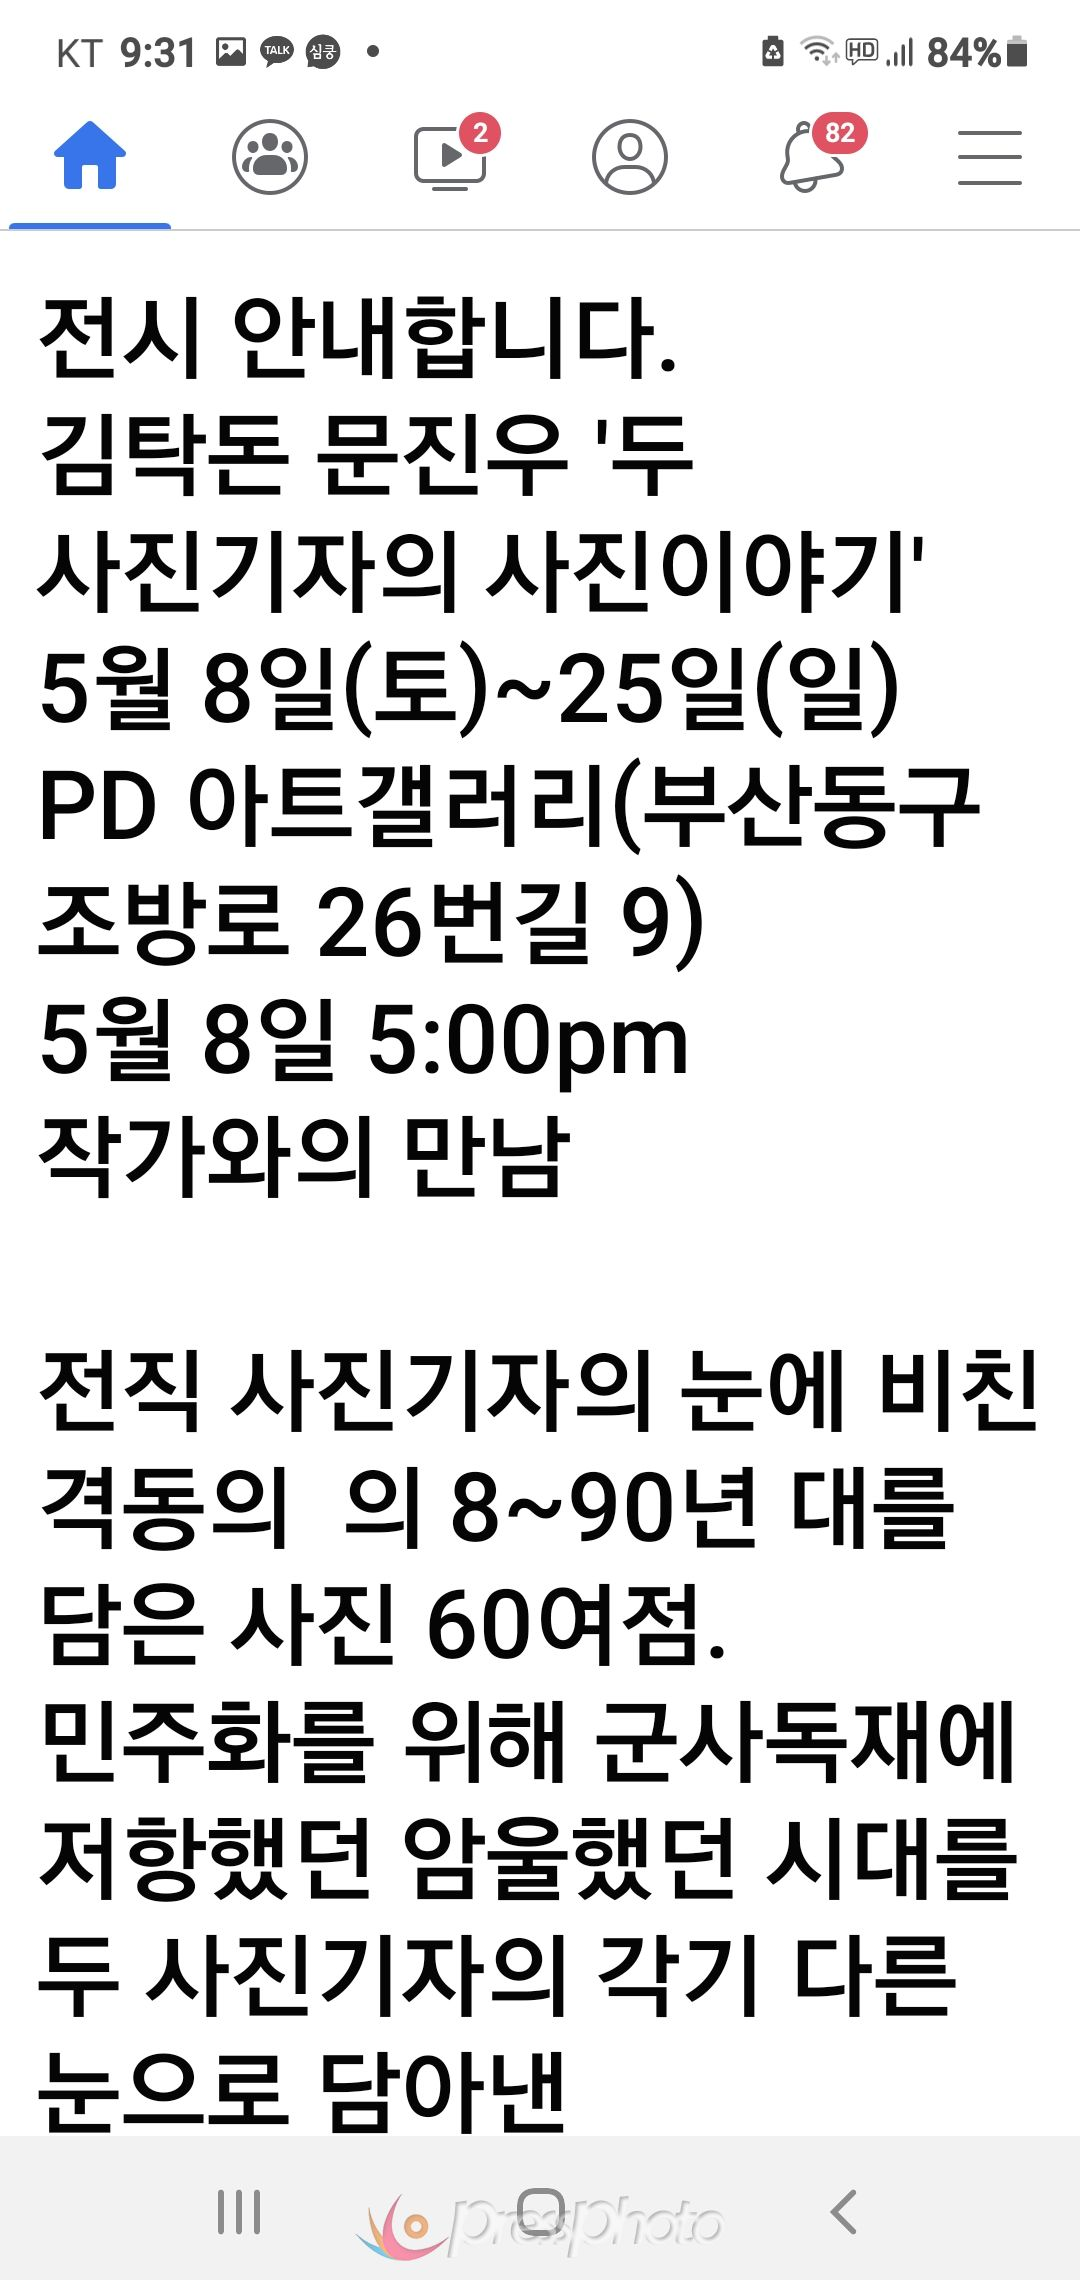 mb-file.php?path=2021%2F04%2F29%2FF798_Screenshot_20210428-093119_Facebook.jpg